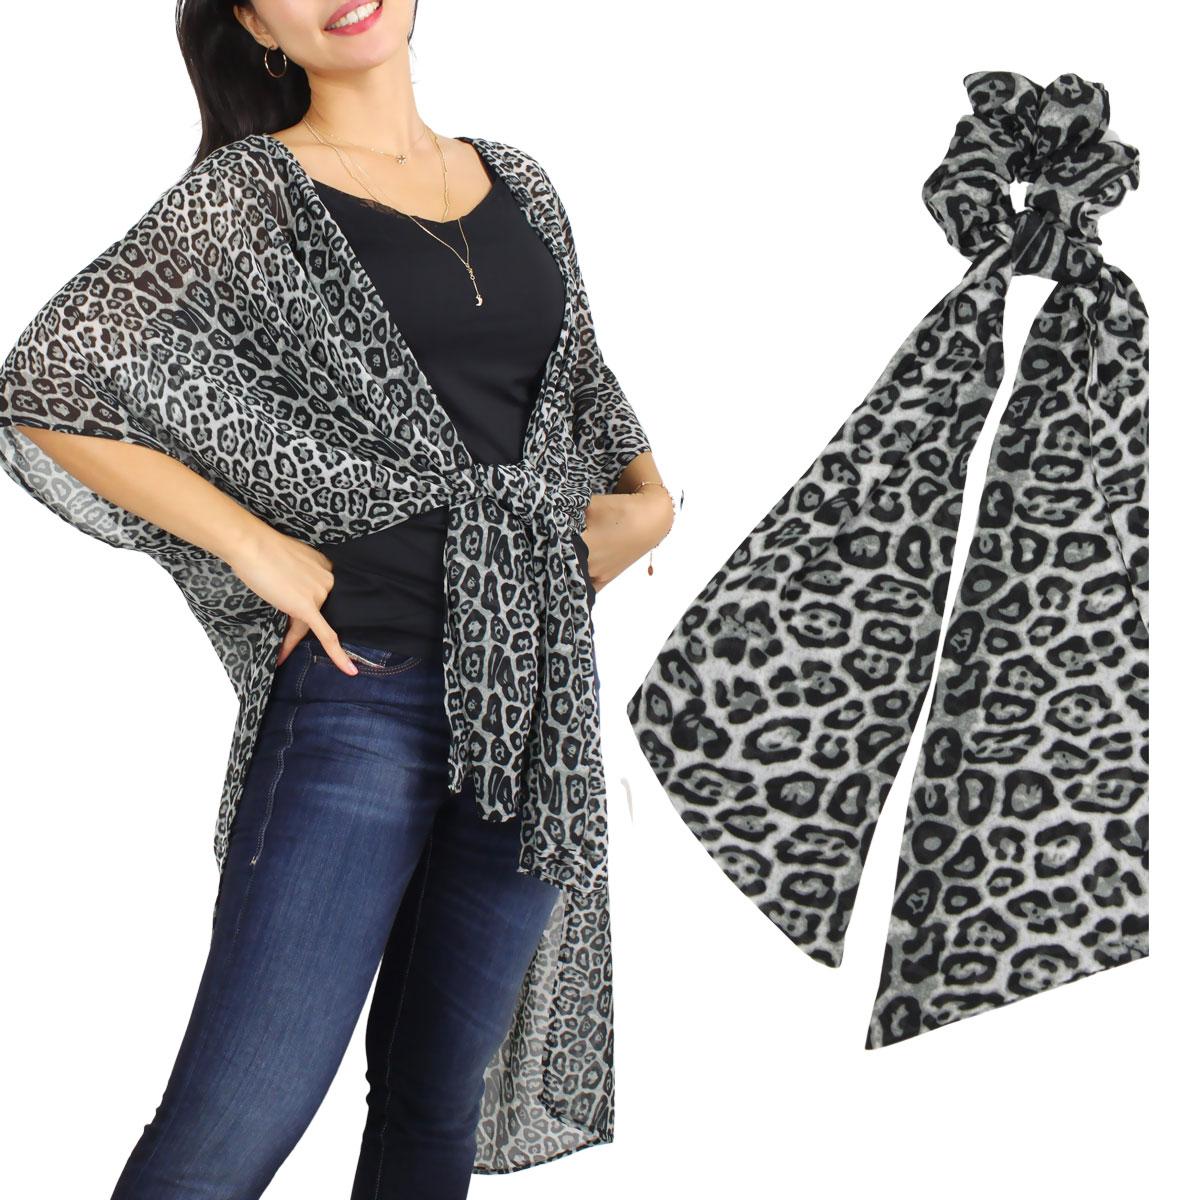 Kimono - Leopard Print 9954